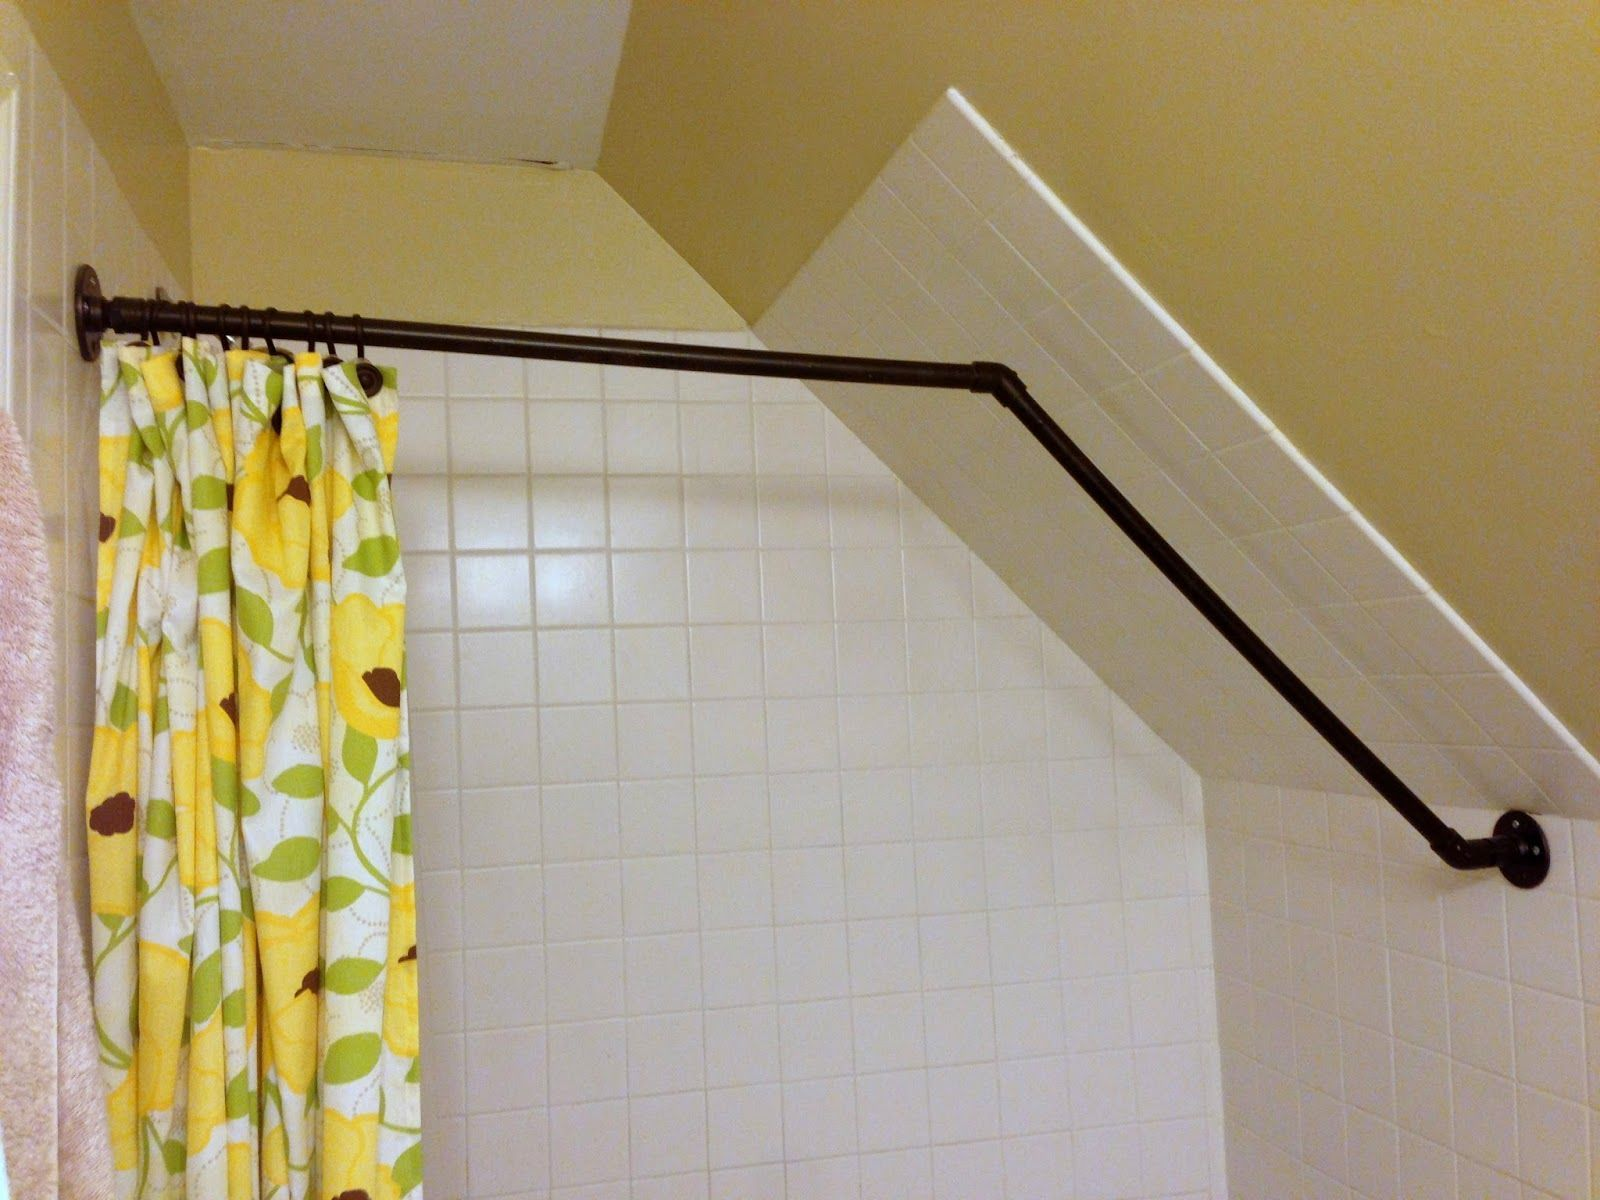 Attic Shower Curtain Rod Attic Shower Sloped Ceiling Bathroom Diy Shower Curtain